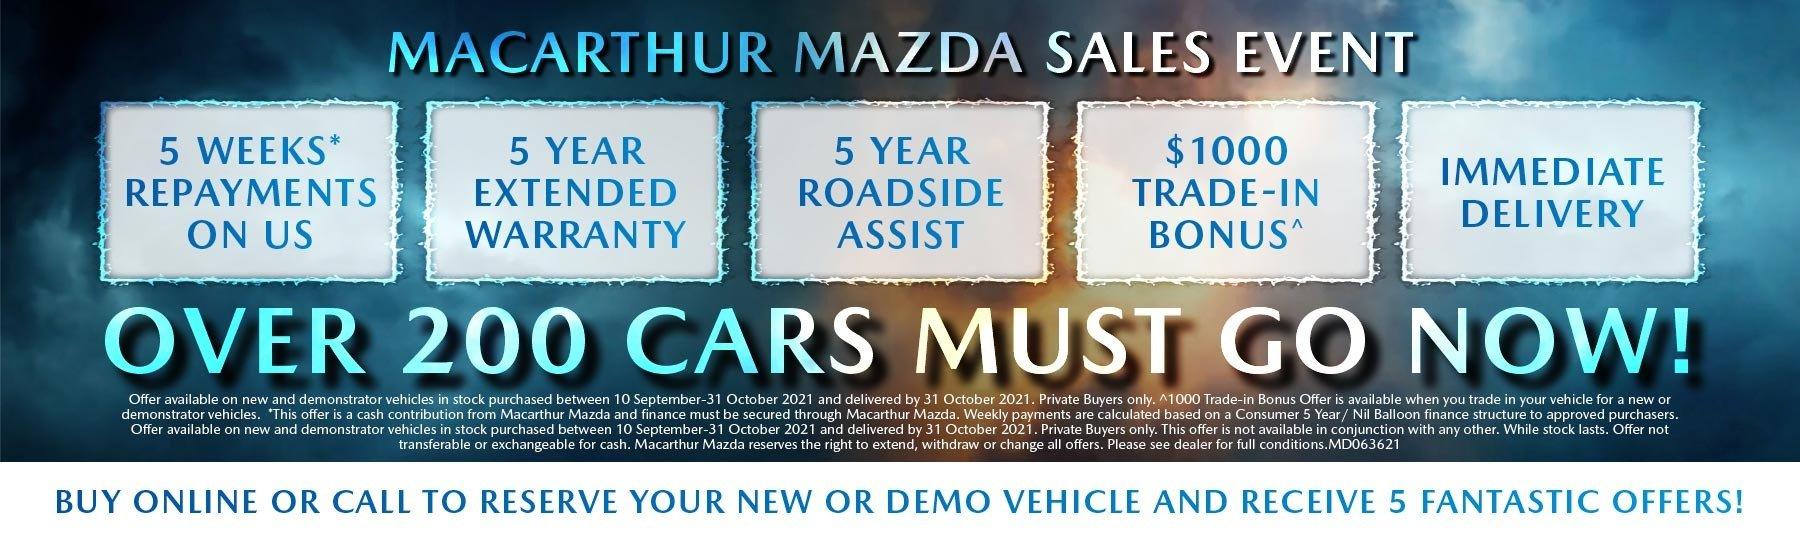 Macarthur Mazda Sale Event!